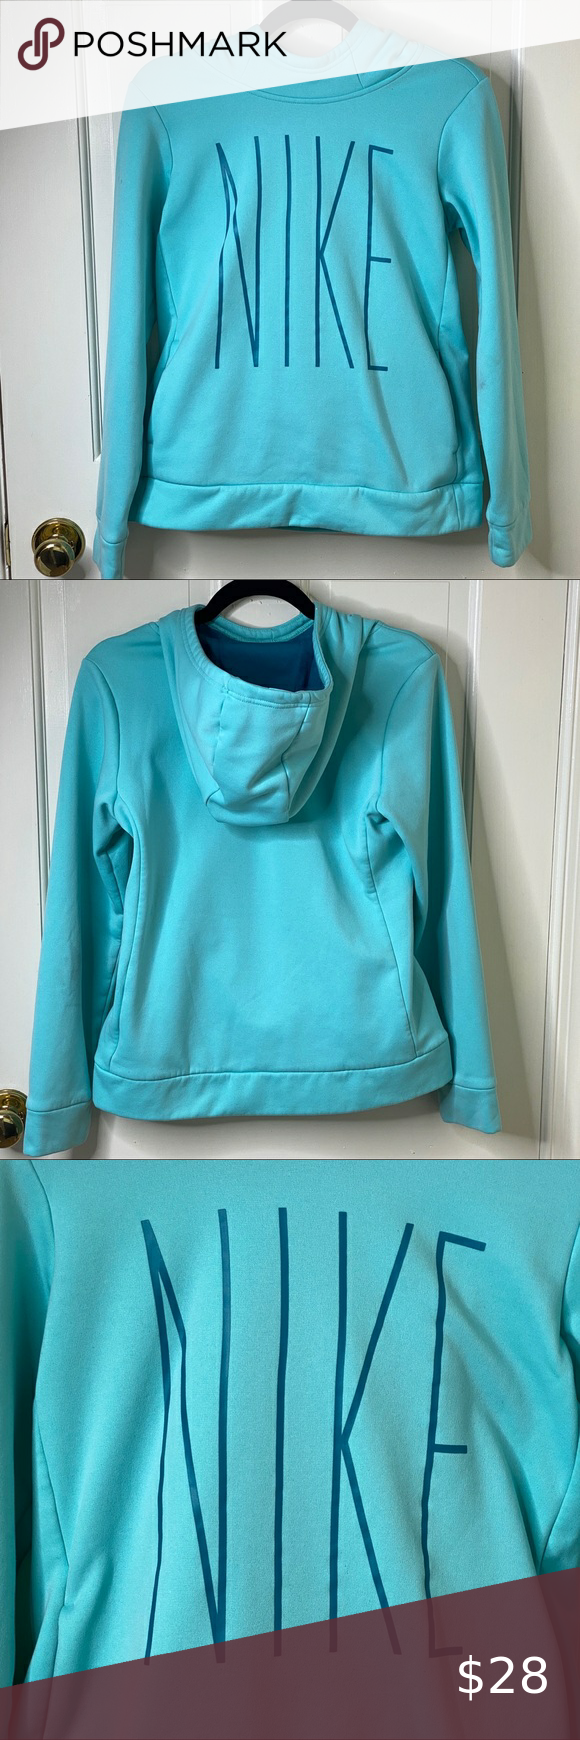 Nike Aqua And Teal Dri Fit Fleece Hoodie A 35 Fleece Hoodie Hoodies Sweatshirts Hoodie [ 1740 x 580 Pixel ]